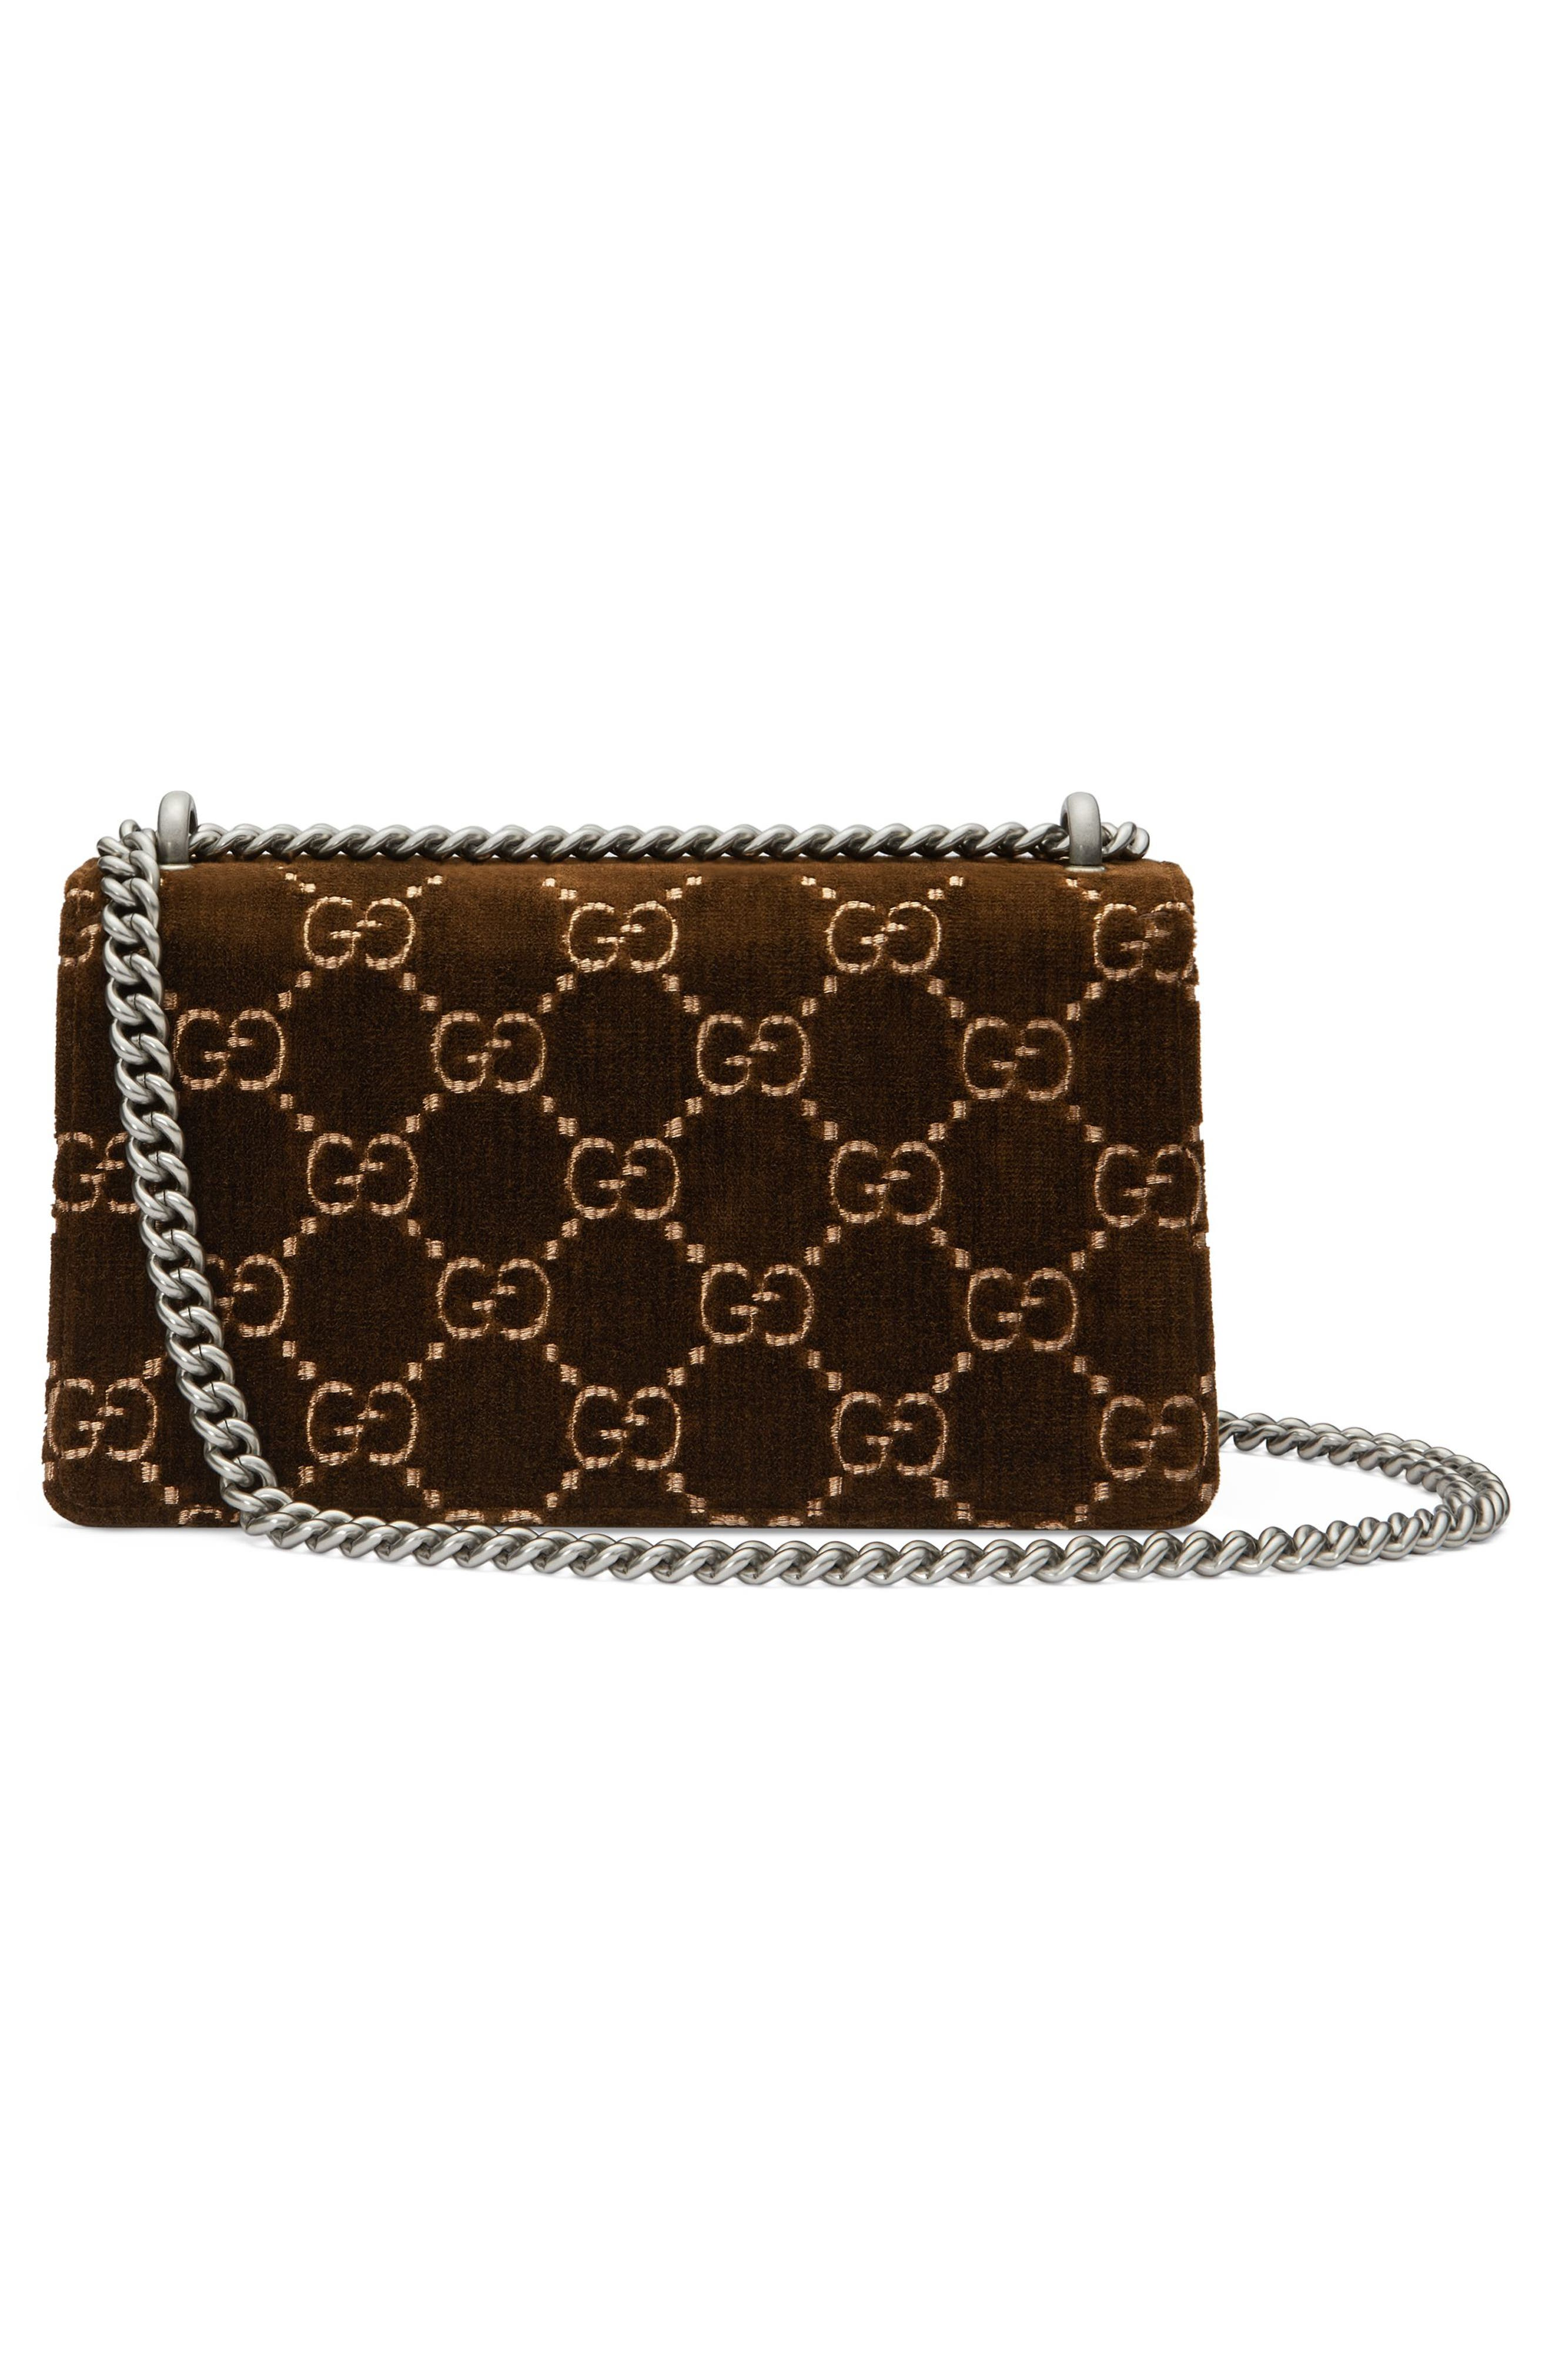 Small Dionysus GG Velvet Shoulder Bag,                             Alternate thumbnail 2, color,                             BROWN